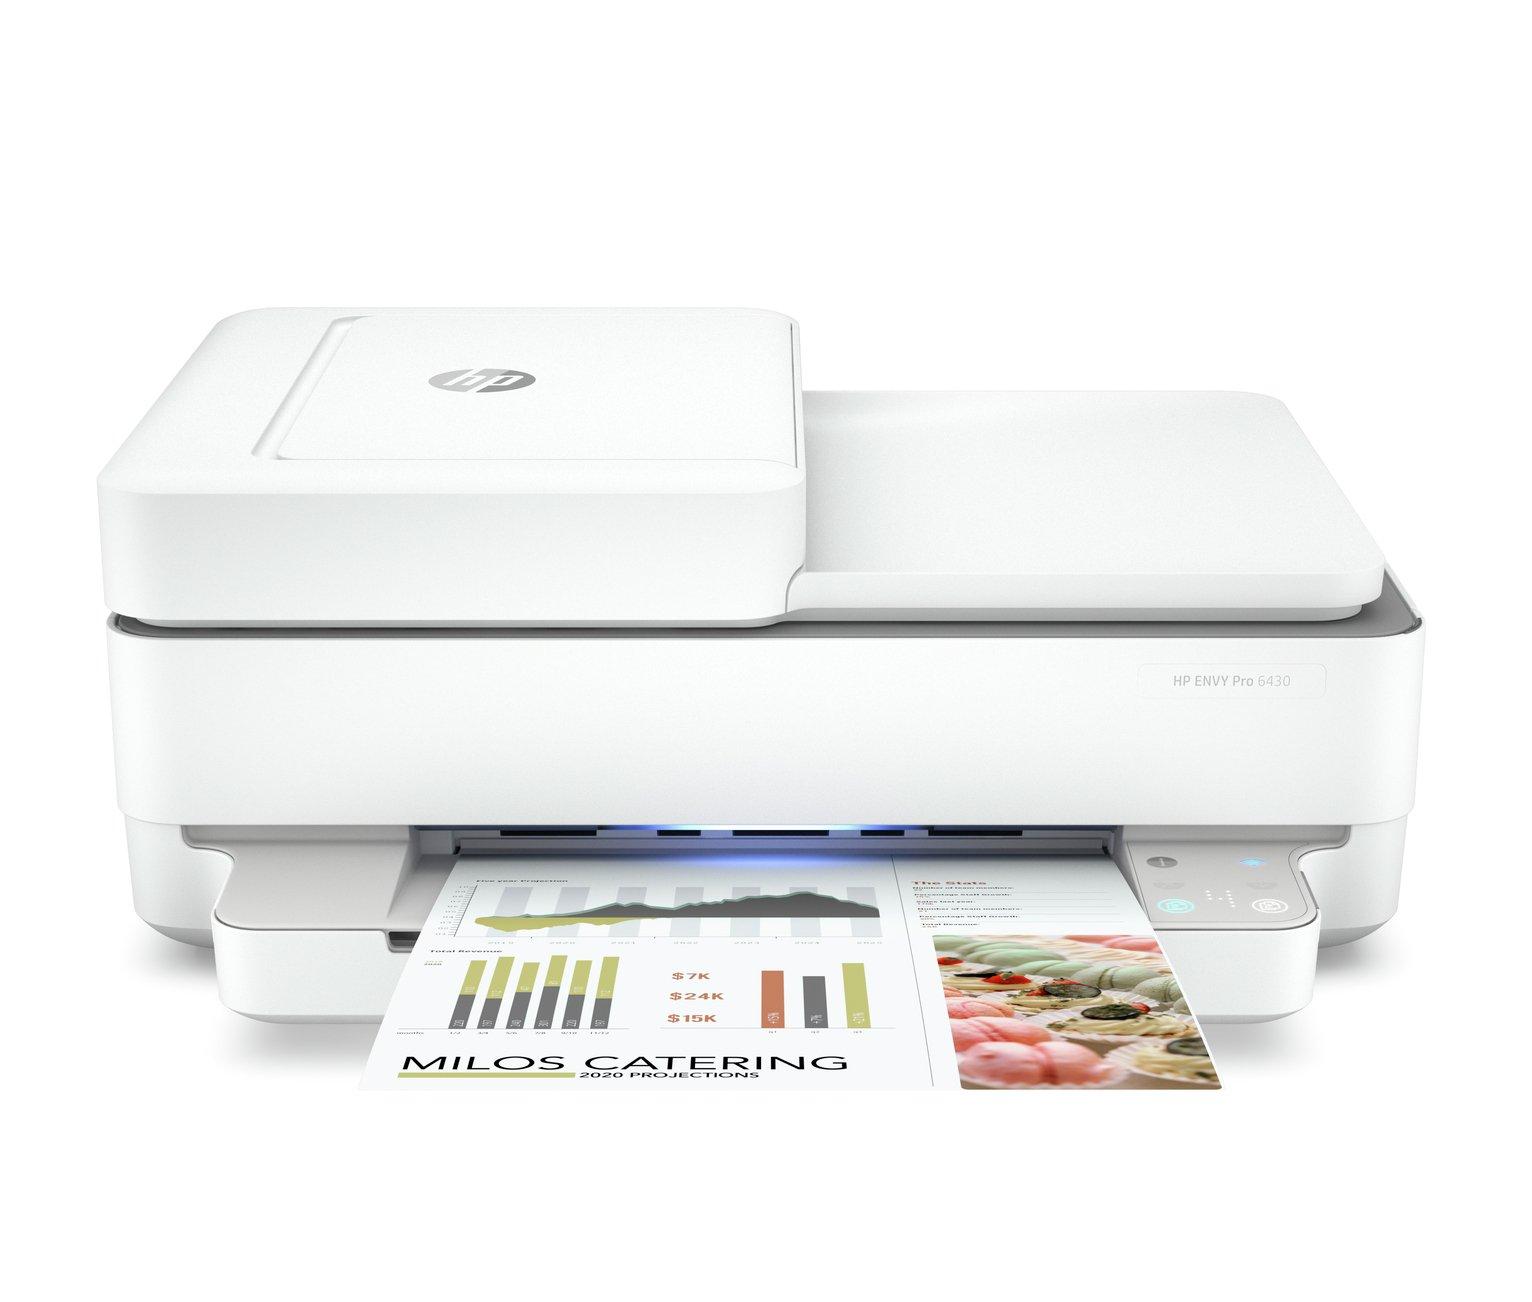 HP Envy 6430 Wireless Printer & 4 Months Instant Ink